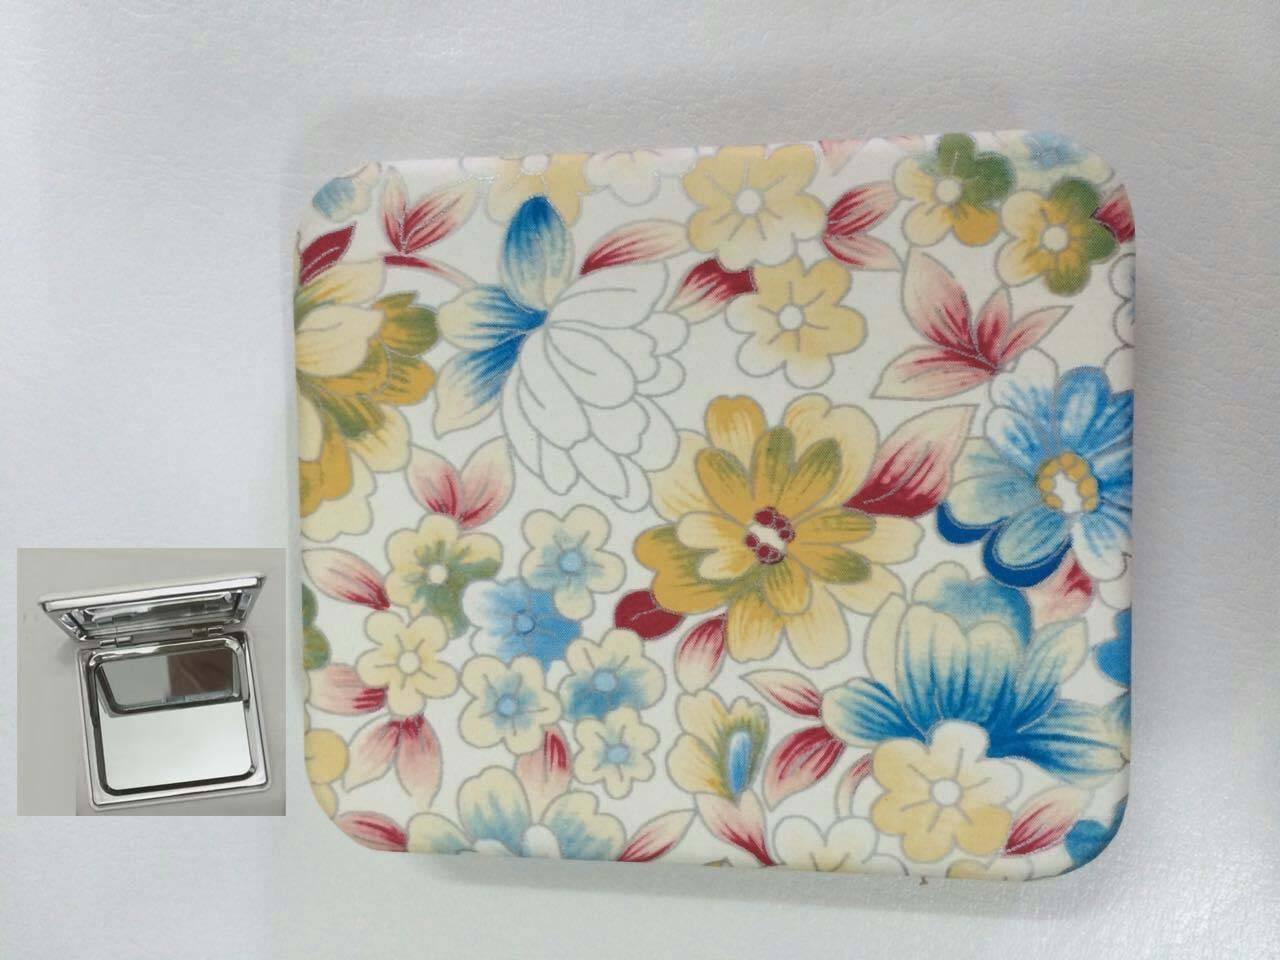 PU Colorful Flowers Printing Compact Mirror LFM6236